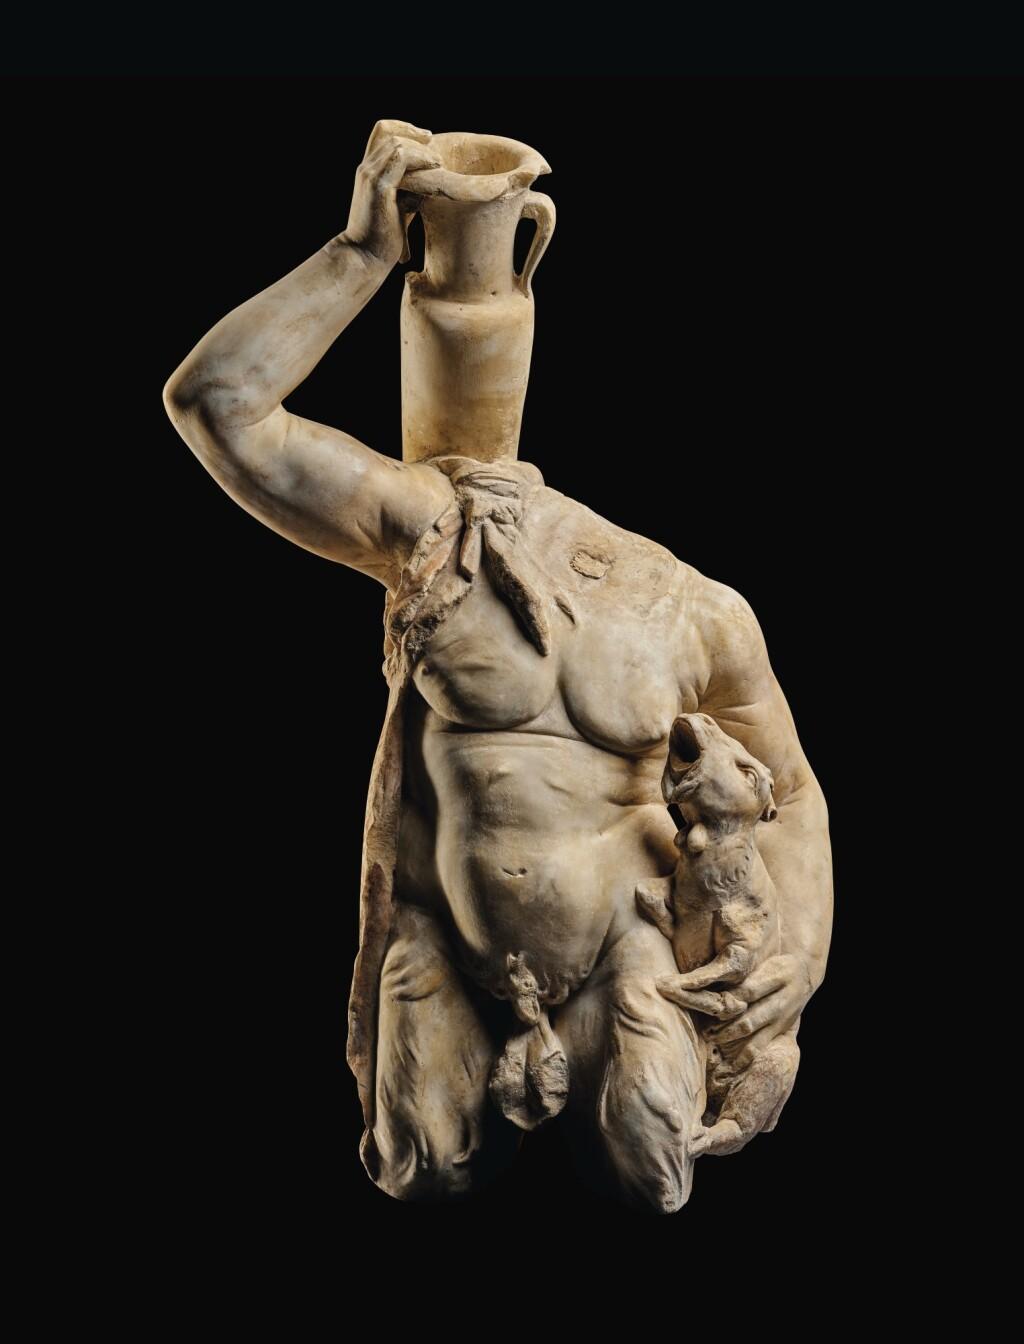 A ROMAN MARBLE FOUNTAIN FIGURE OF PAN, CIRCA 2ND CENTURY A.D.